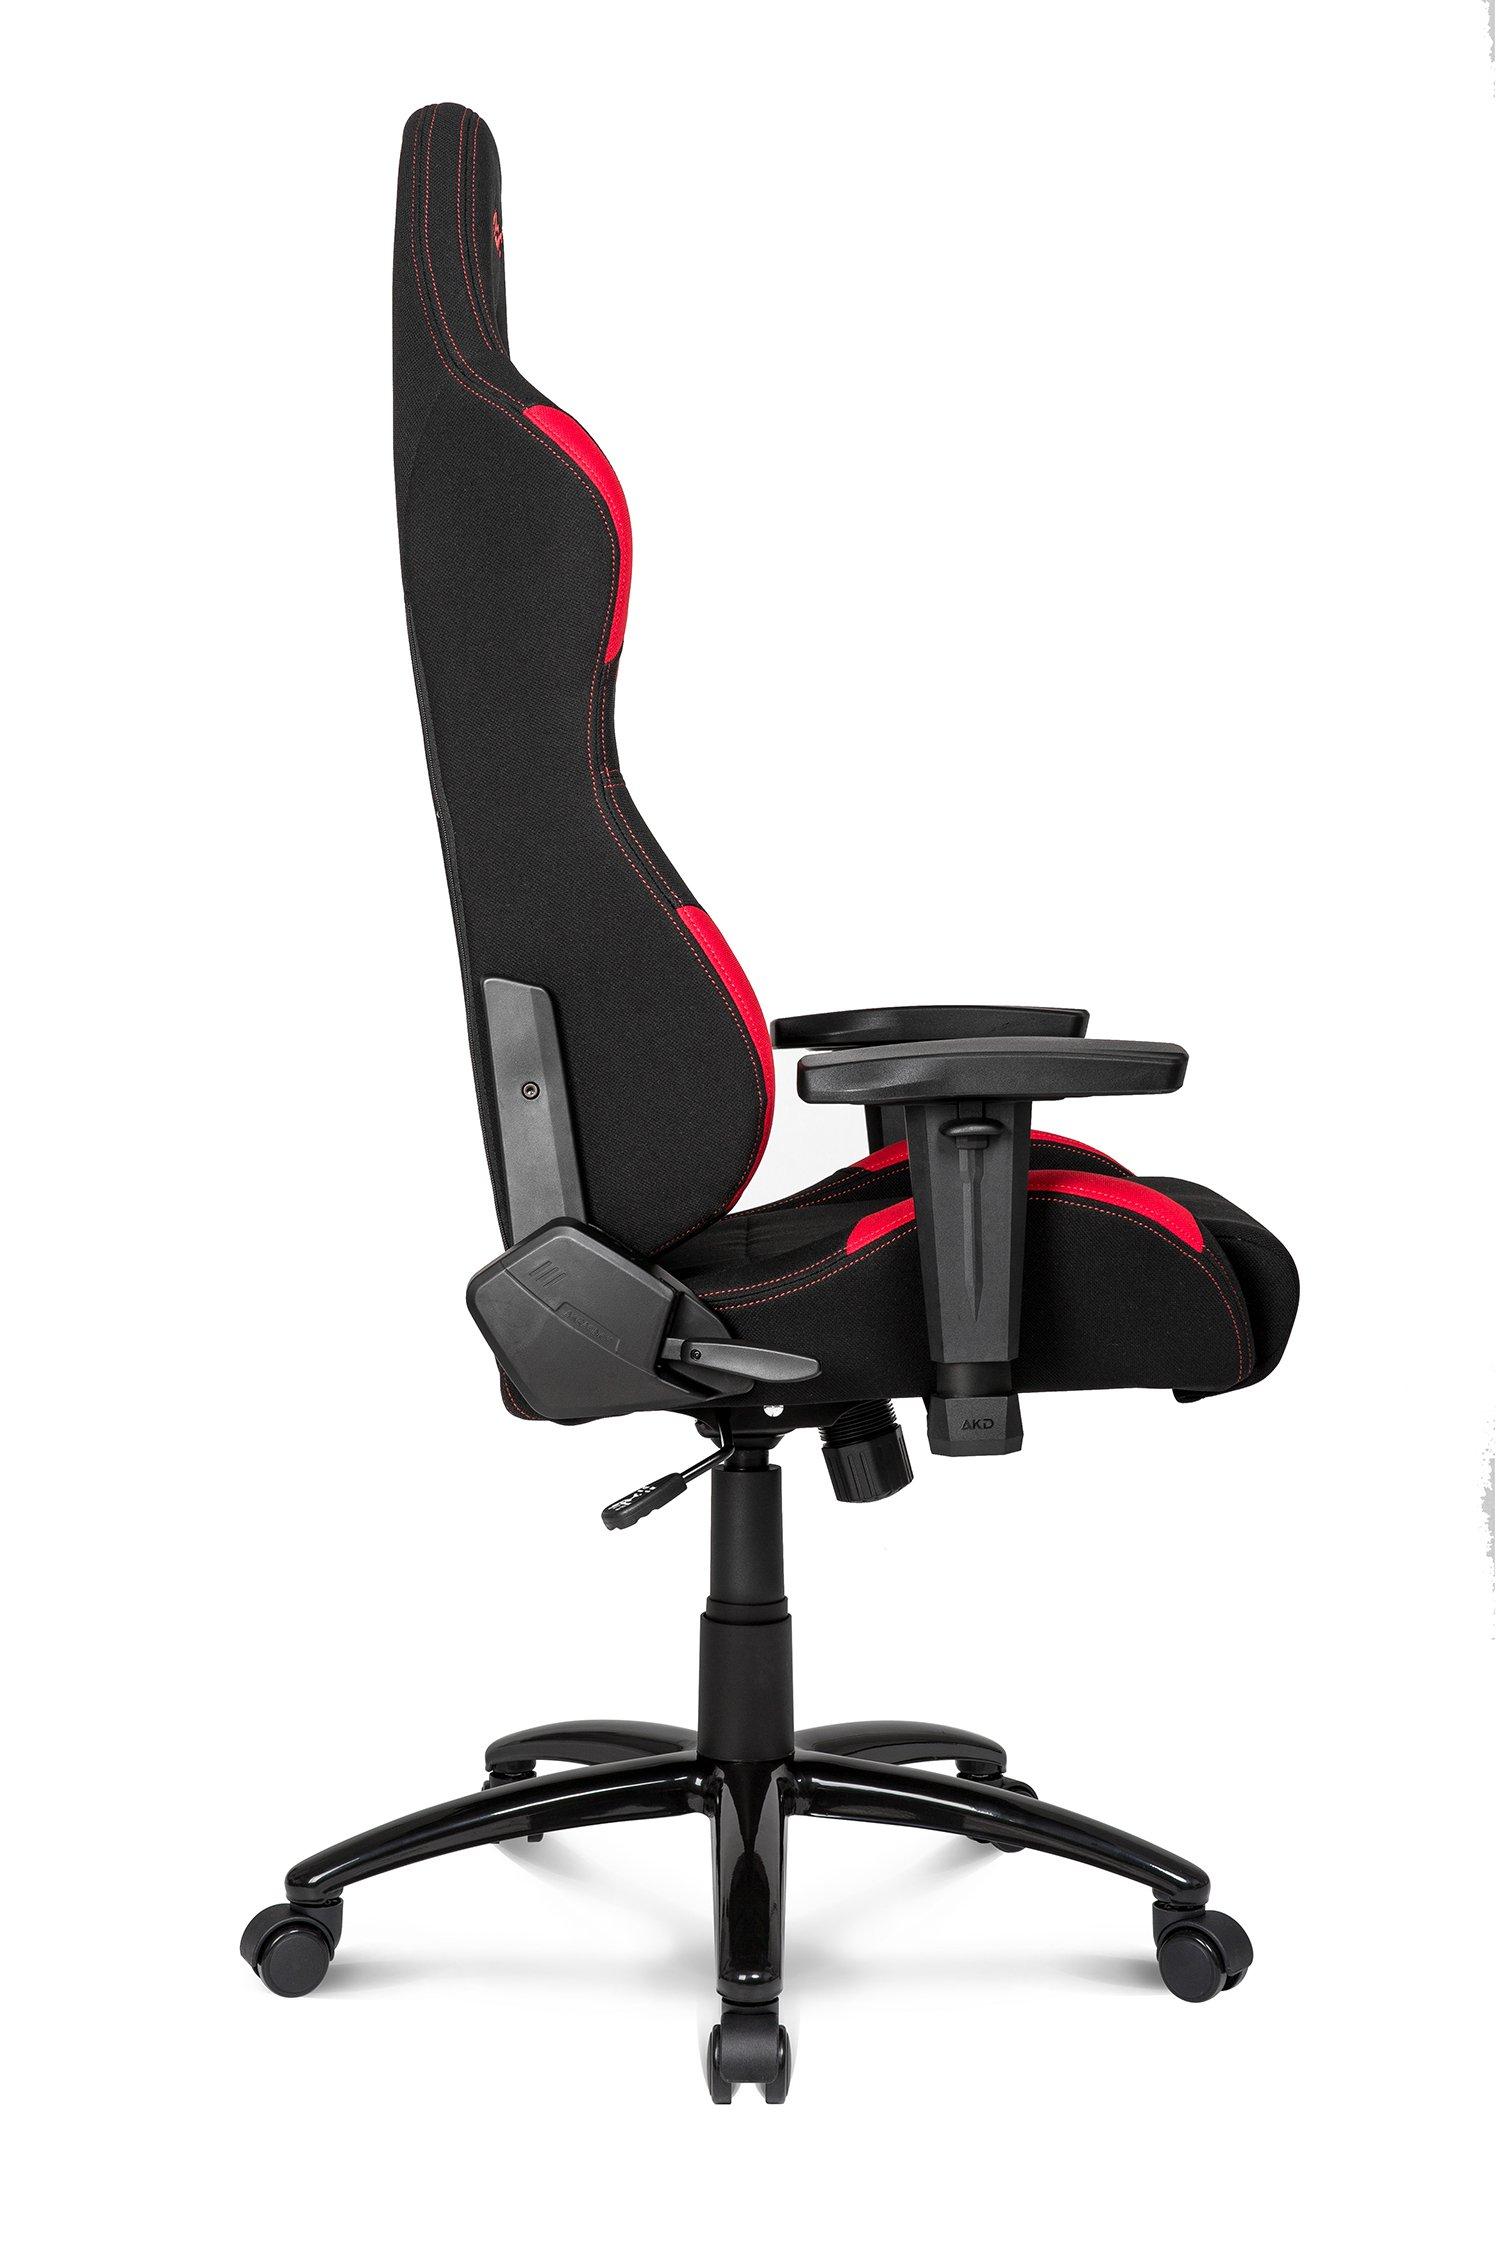 AKRacing K7012 – AK-K7012-BR – Silla Gaming, Color Negro/Rojo